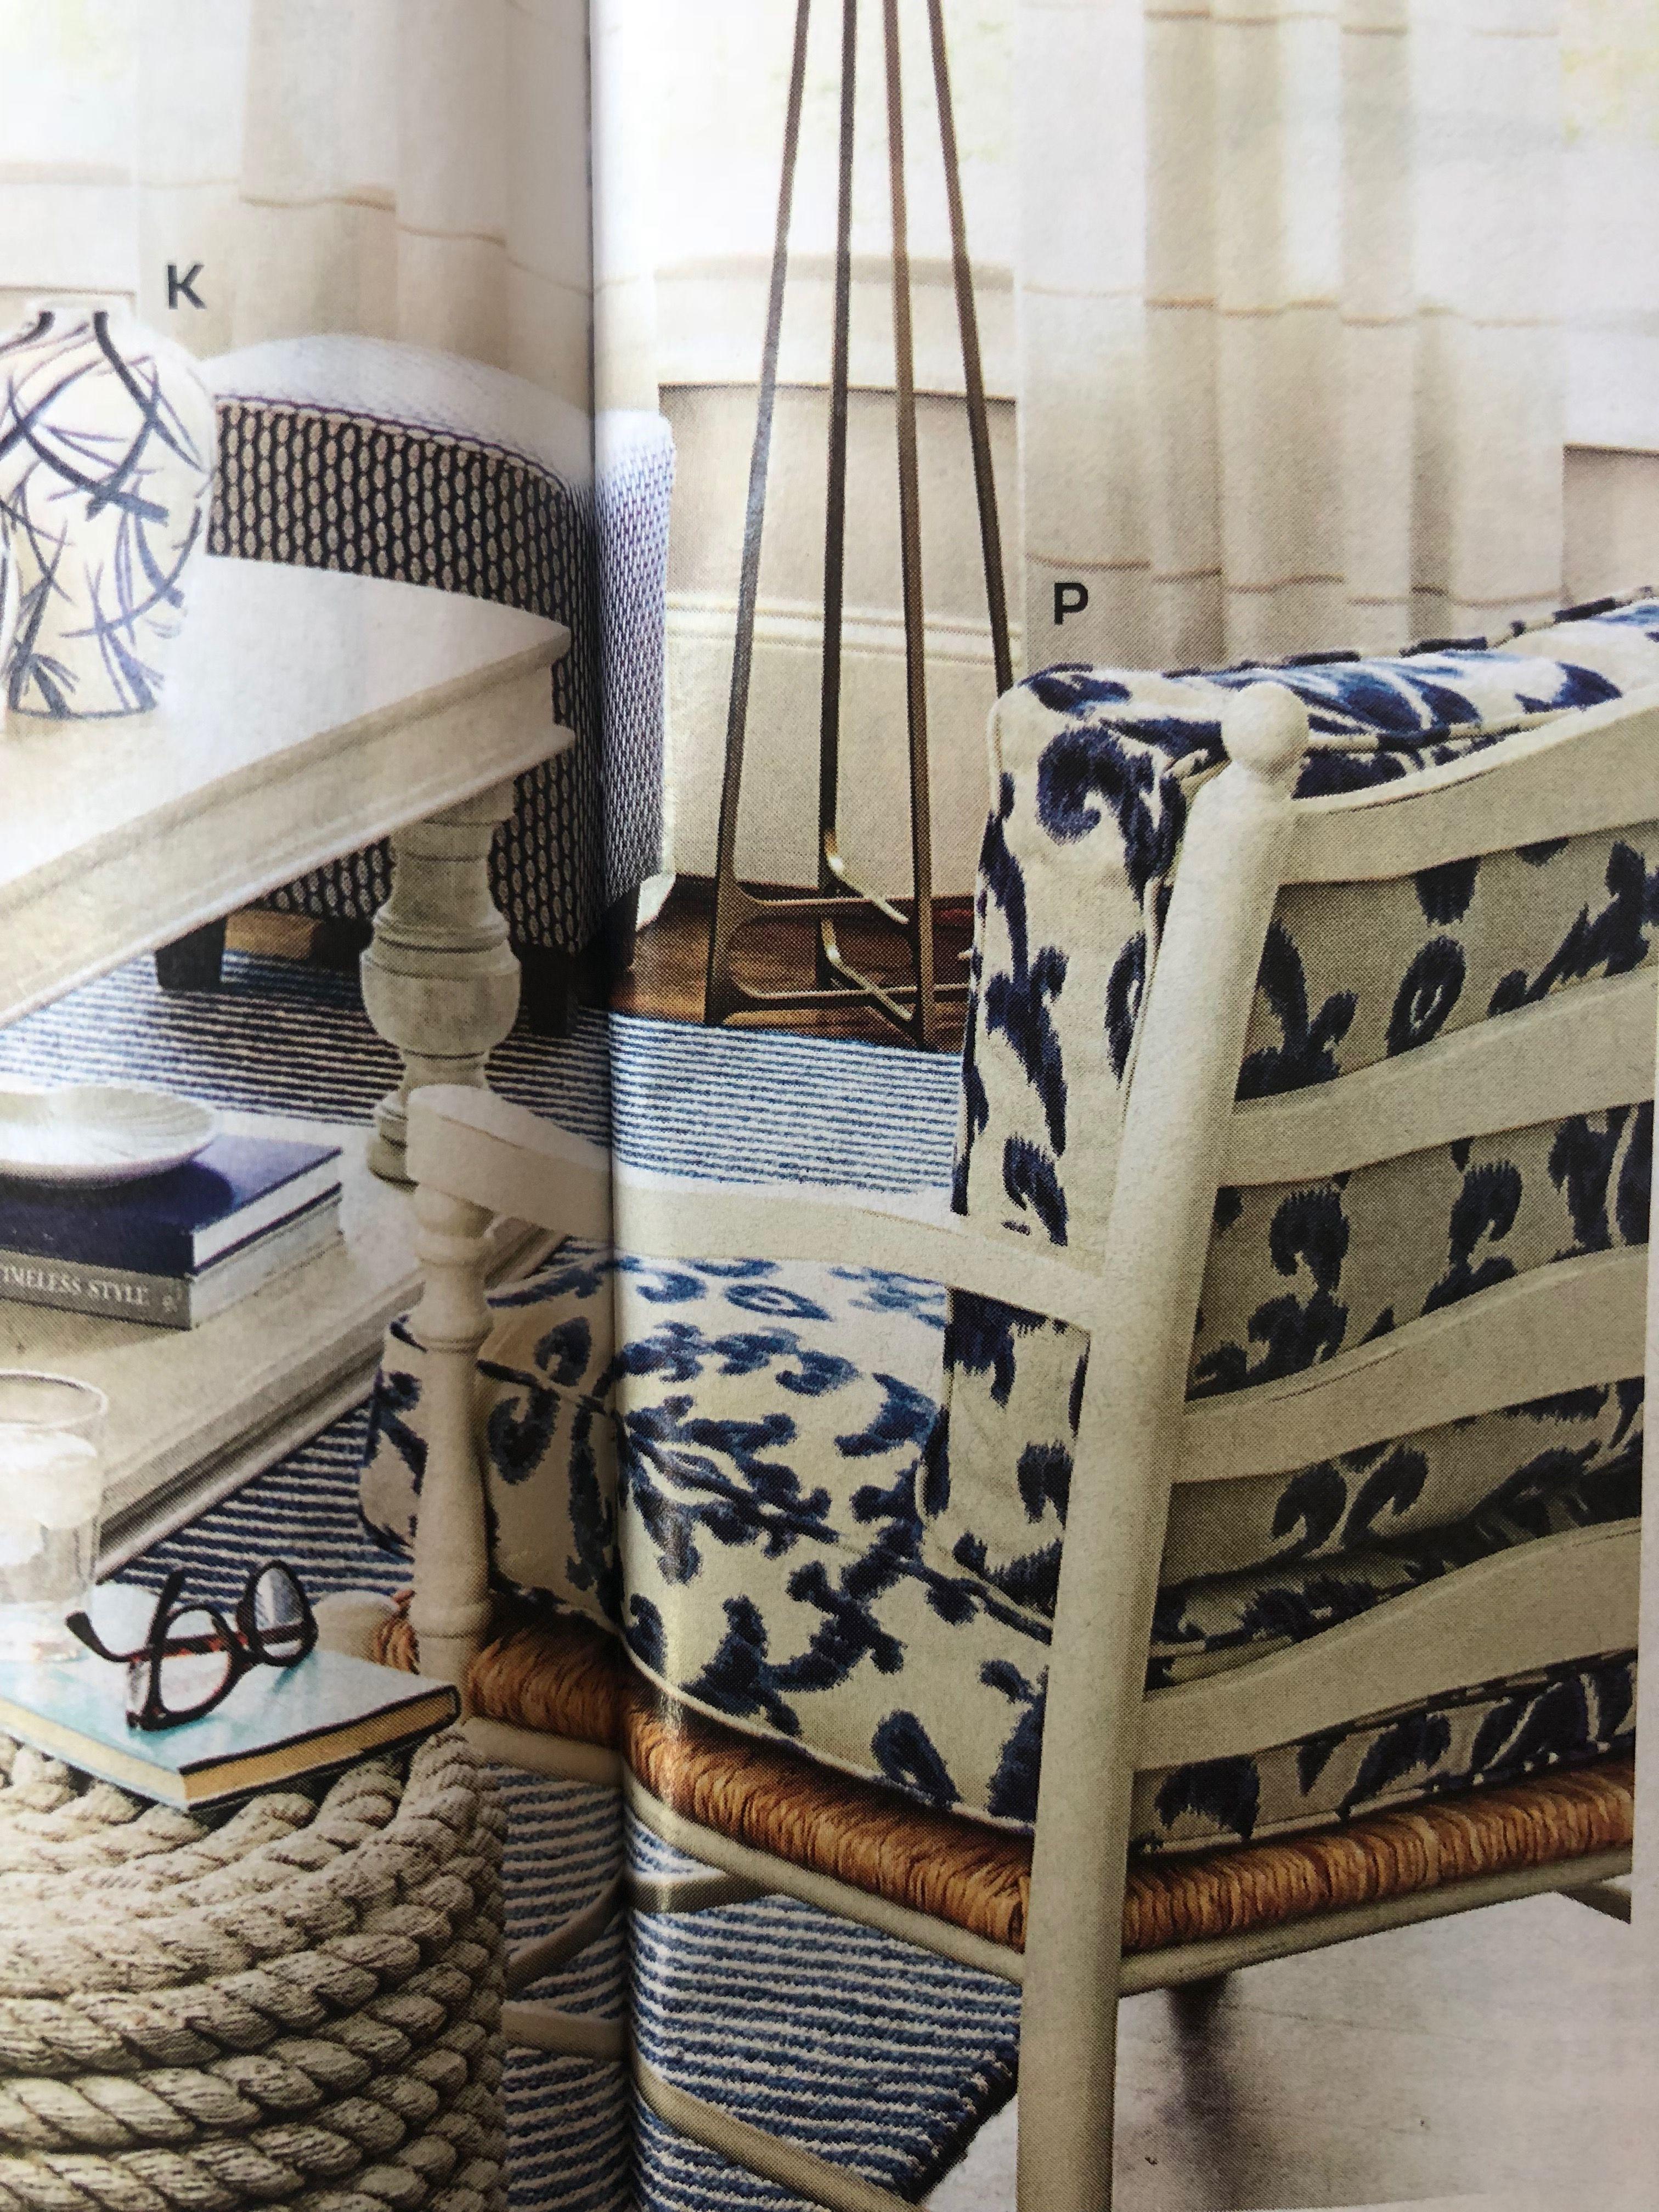 Wondrous Toulon Chair And Ottoman Ballard Designs Shown In Amal Blue Short Links Chair Design For Home Short Linksinfo